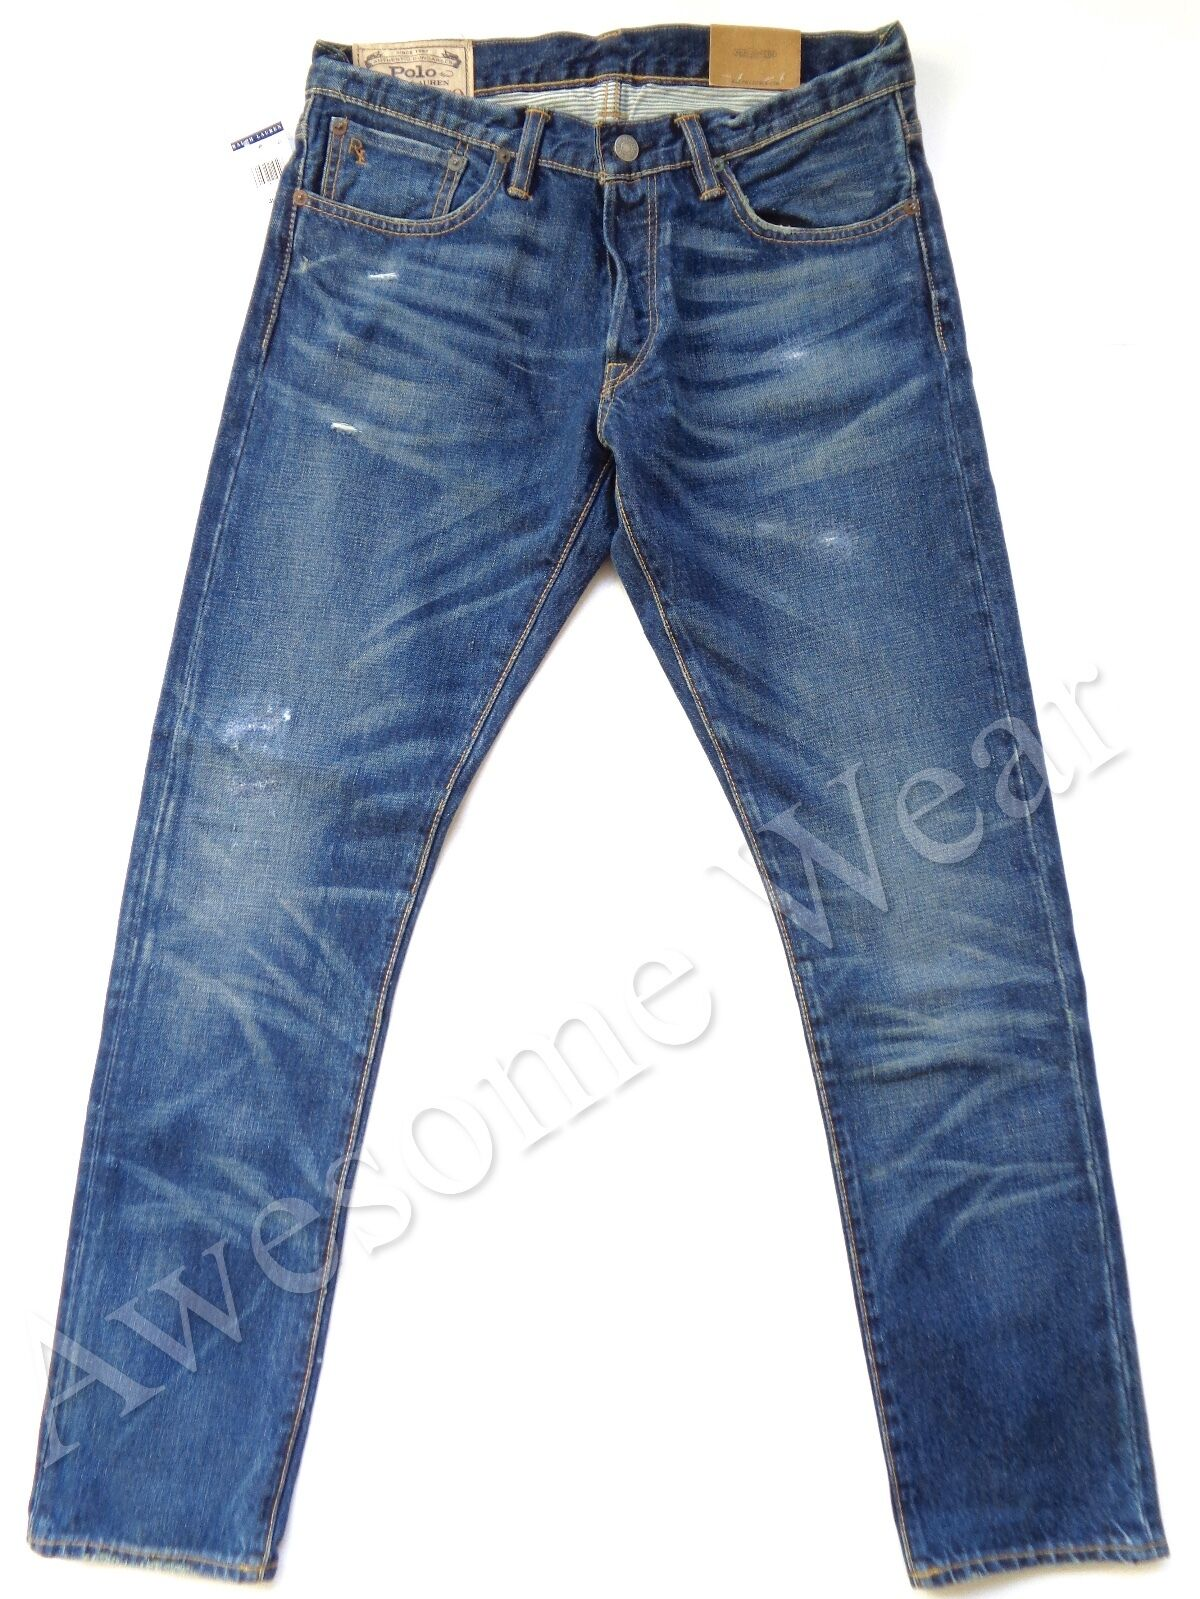 New Ralph Lauren Polo 100% Cotton Sullivan Slim Distressed Jeans size 35 x 32